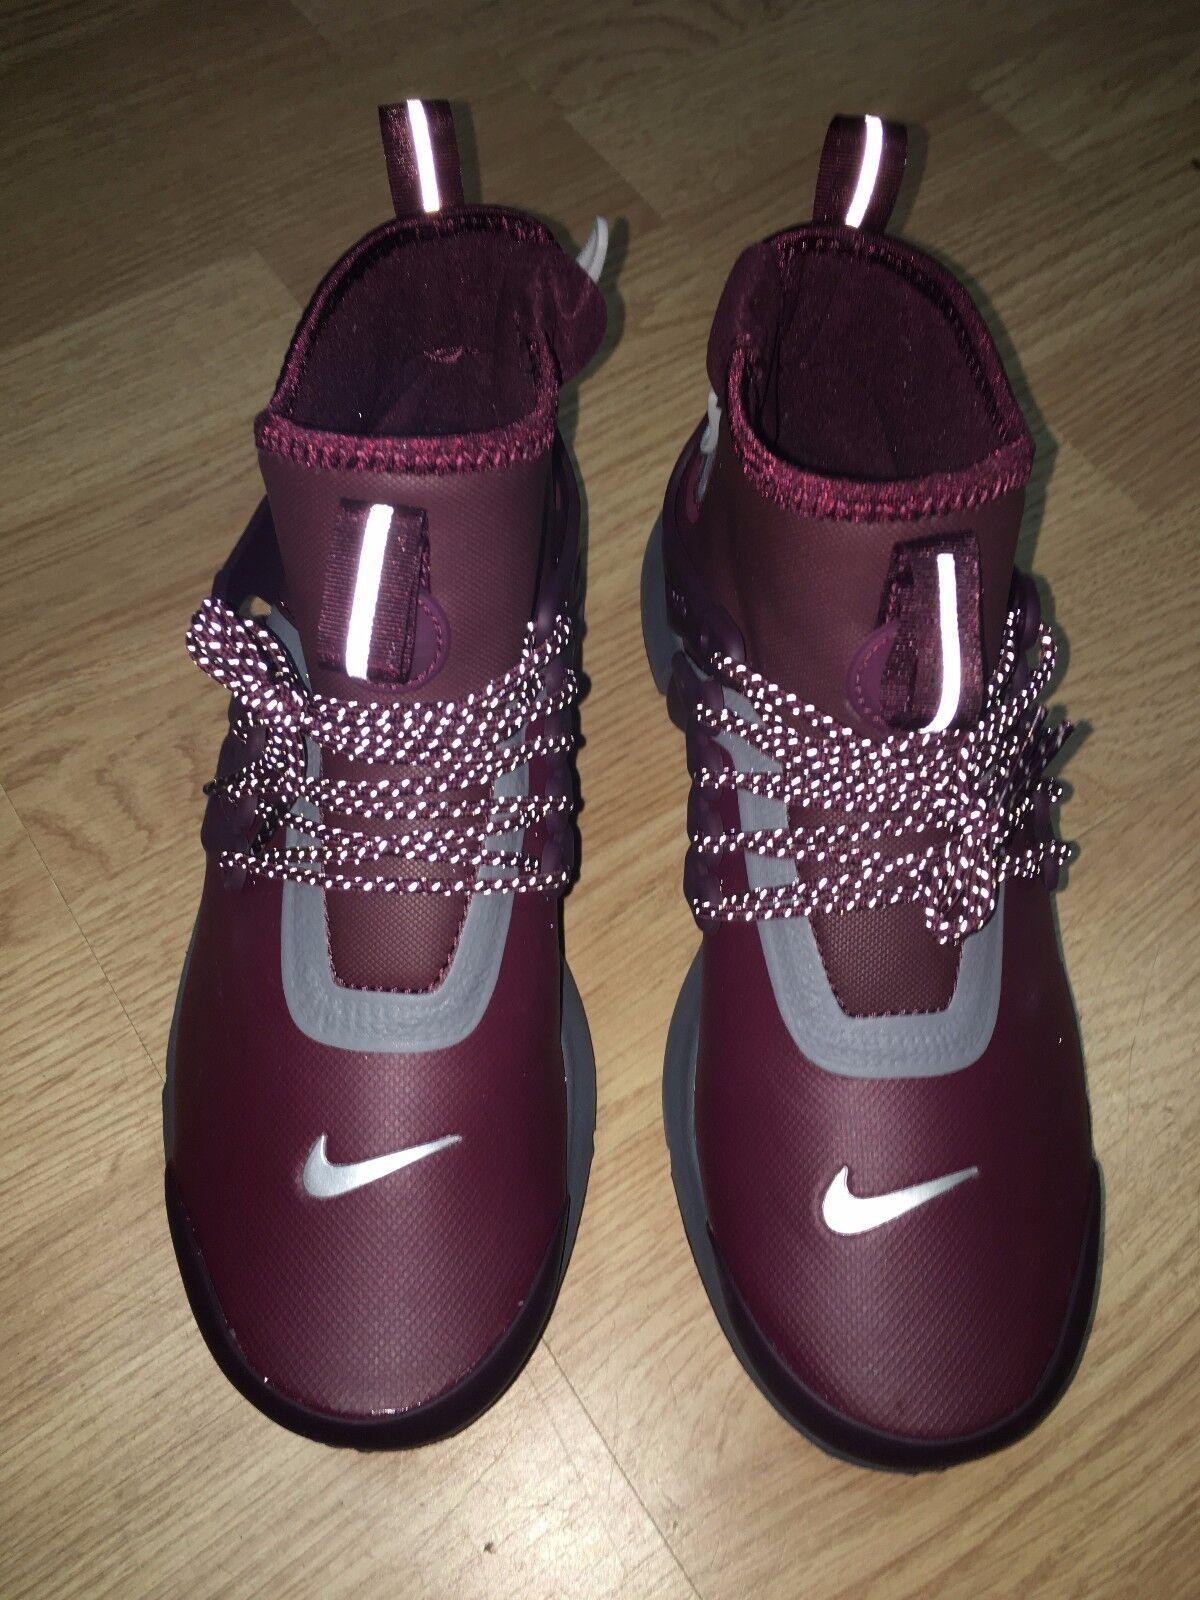 Nike Air Presto Mid Utility Wmn 859527-600 859527-600 859527-600 Night Maroon Reflect 3M Women's Rare 68b044